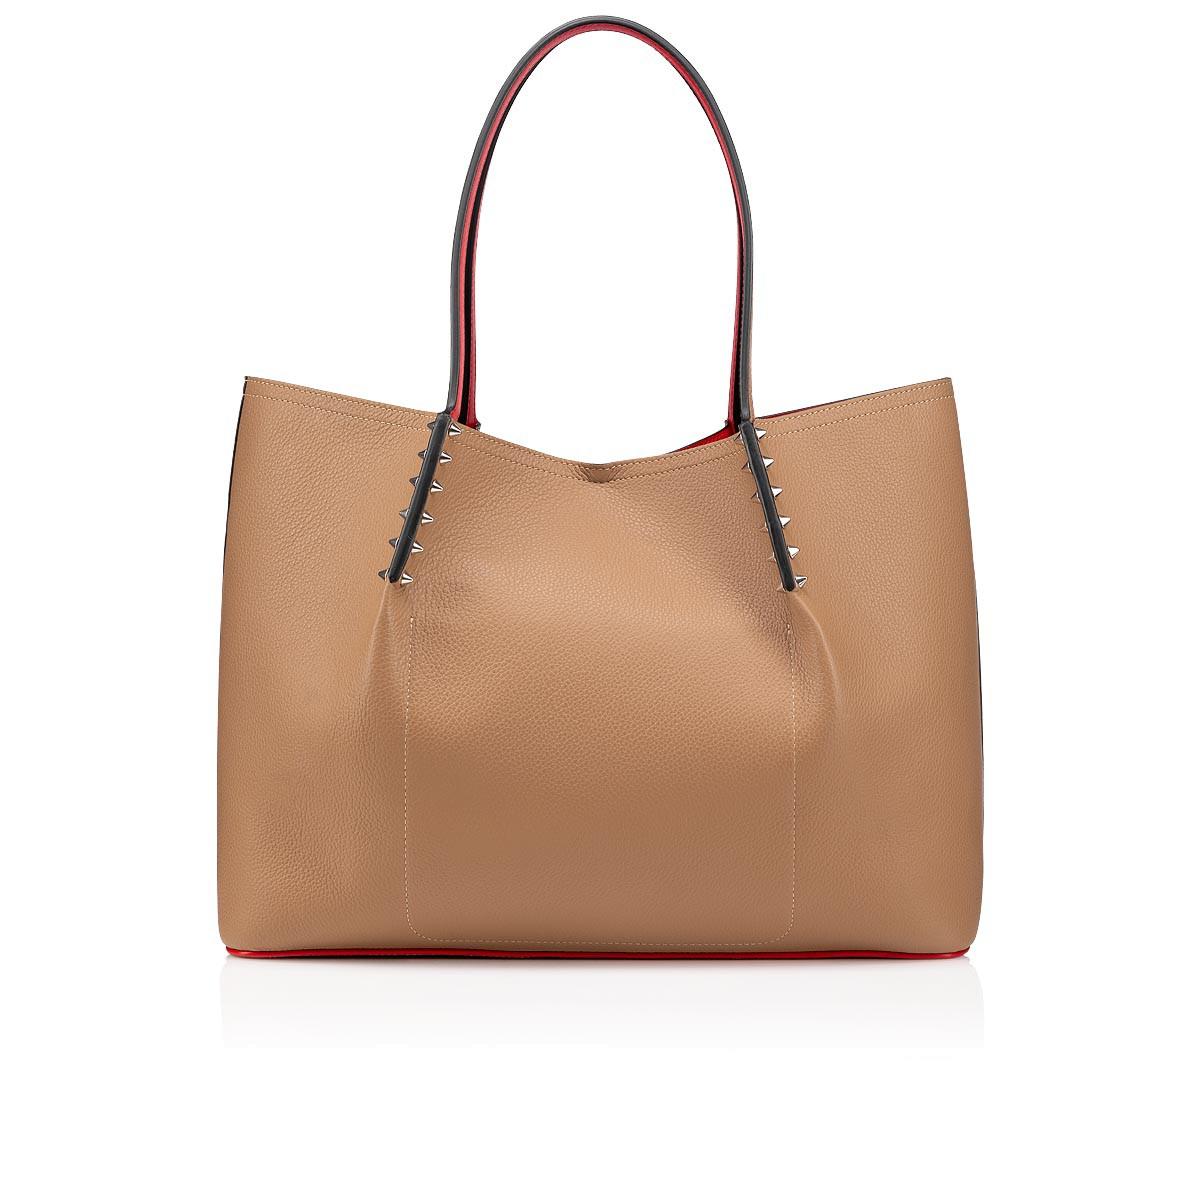 Bags - Cabarock Large - Christian Louboutin